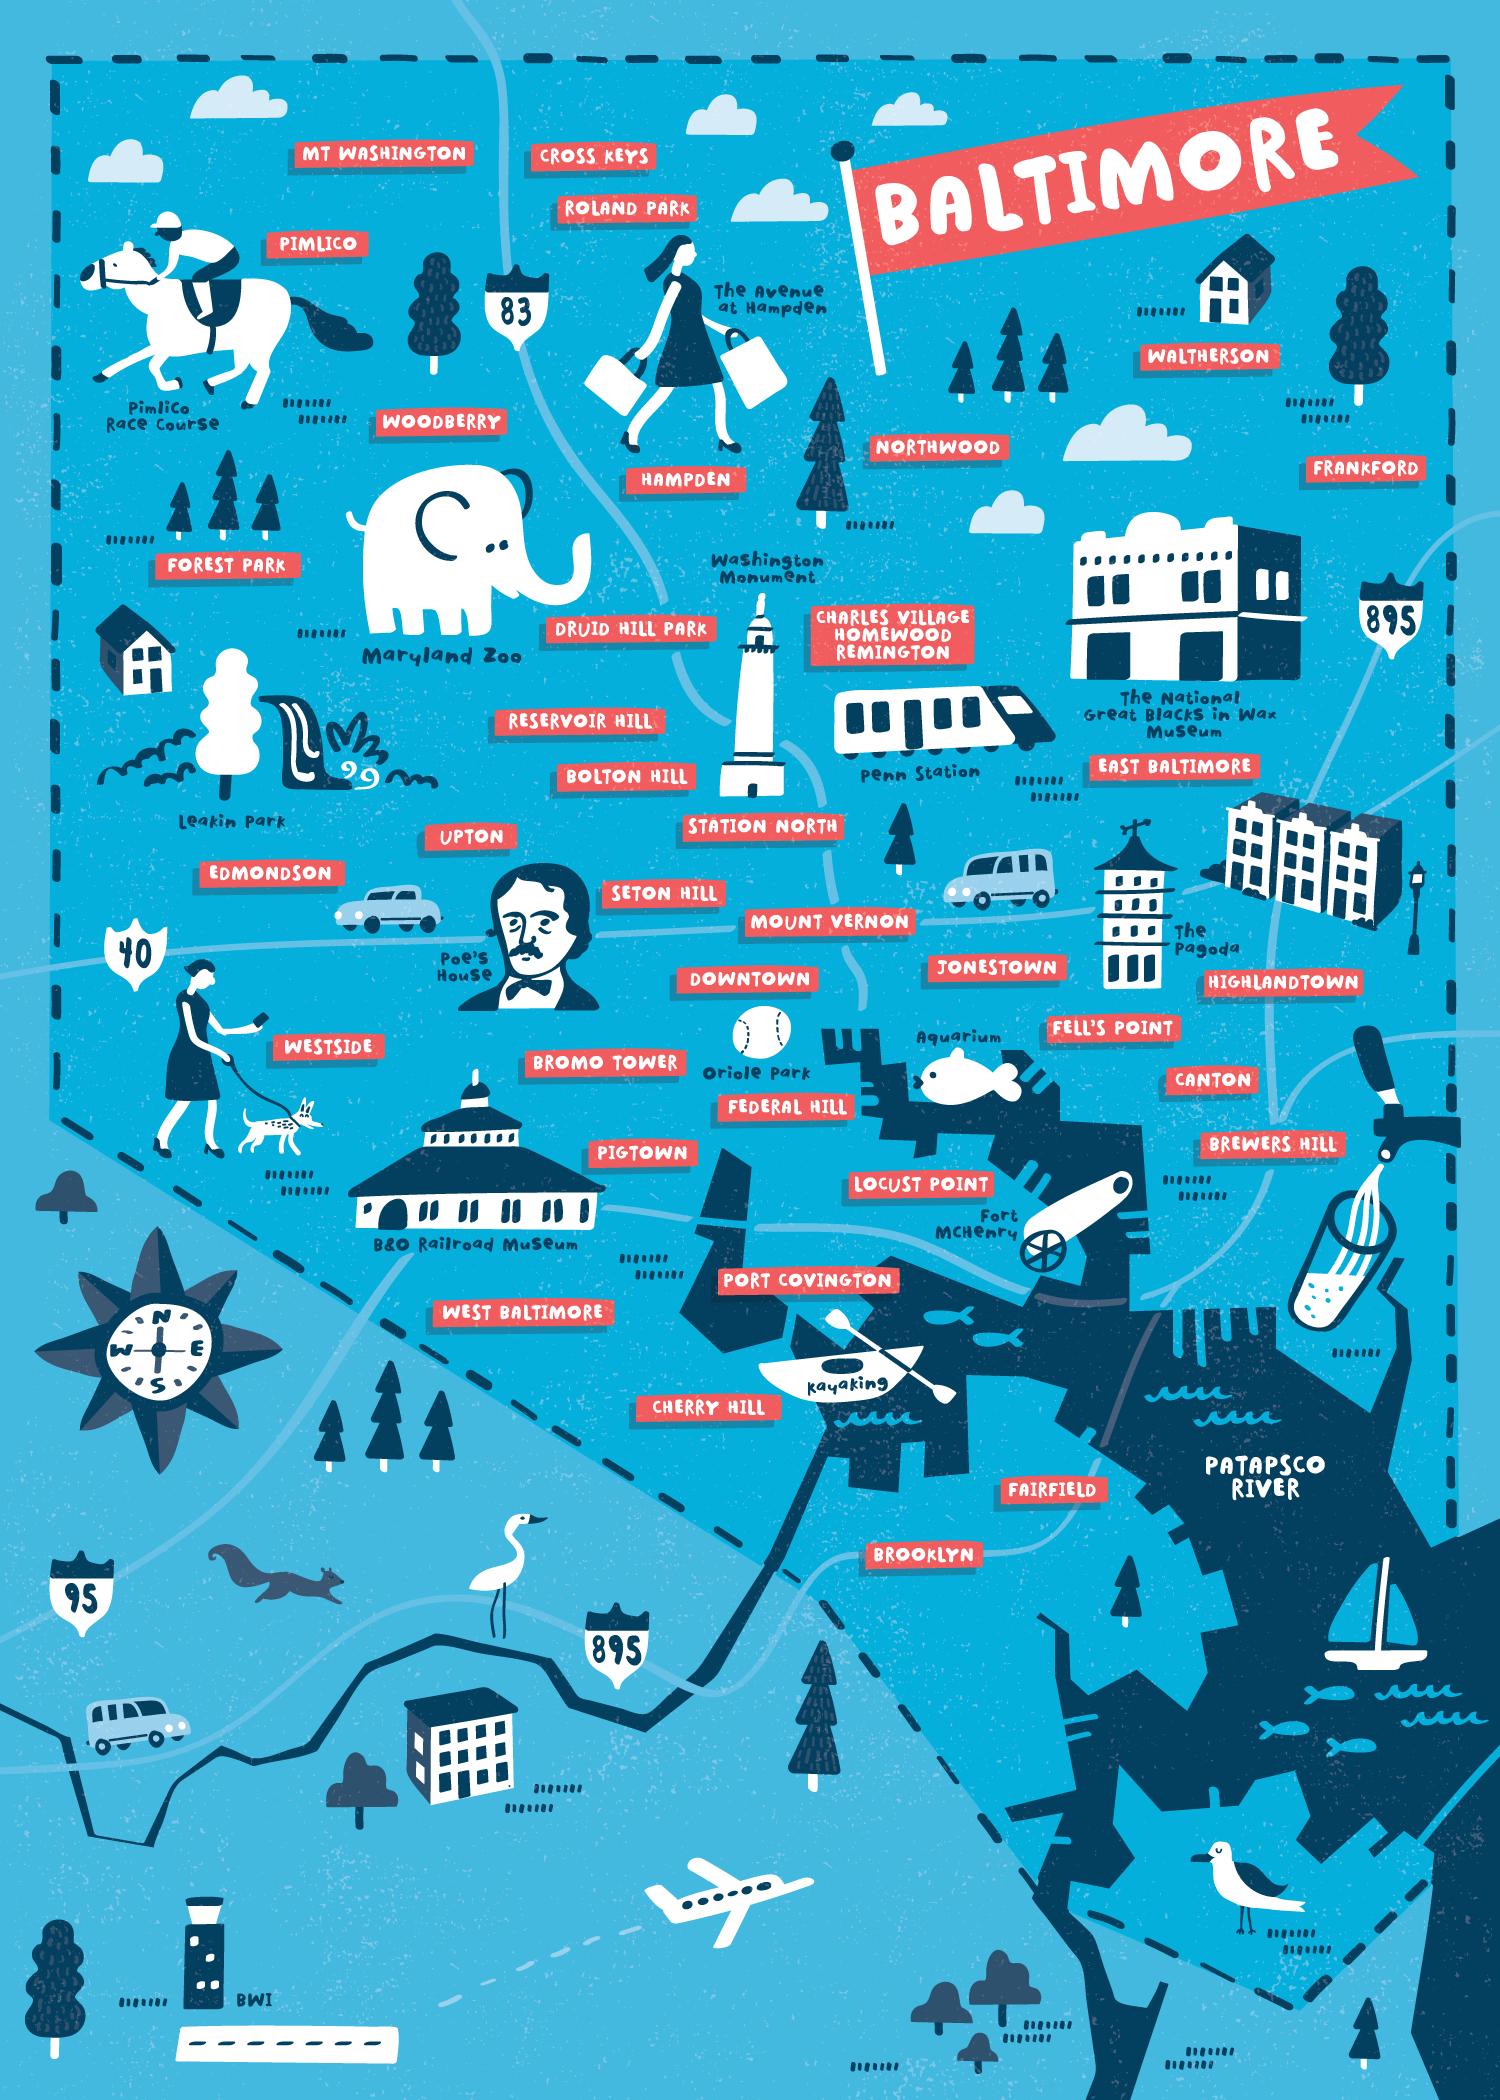 Baltimore-Fun-Map-by-Nate-Padavick.png